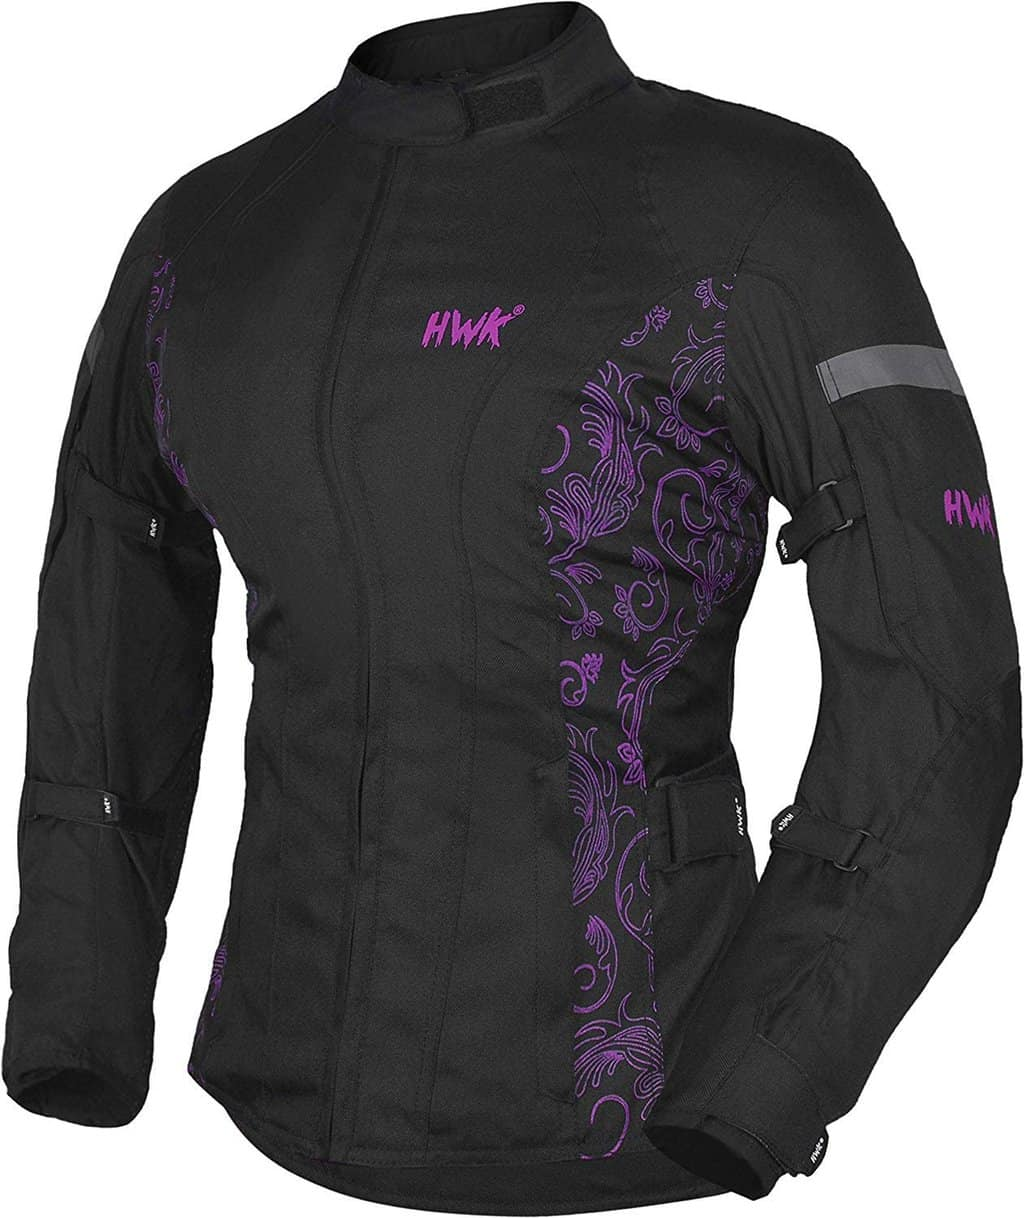 HWK-Womens-Motorcycle-Jacket-For-Women-Rain-Waterproof-Biker-Moto-Riding-Ladies-Motorbike-Jackets-CE-ARMORED.